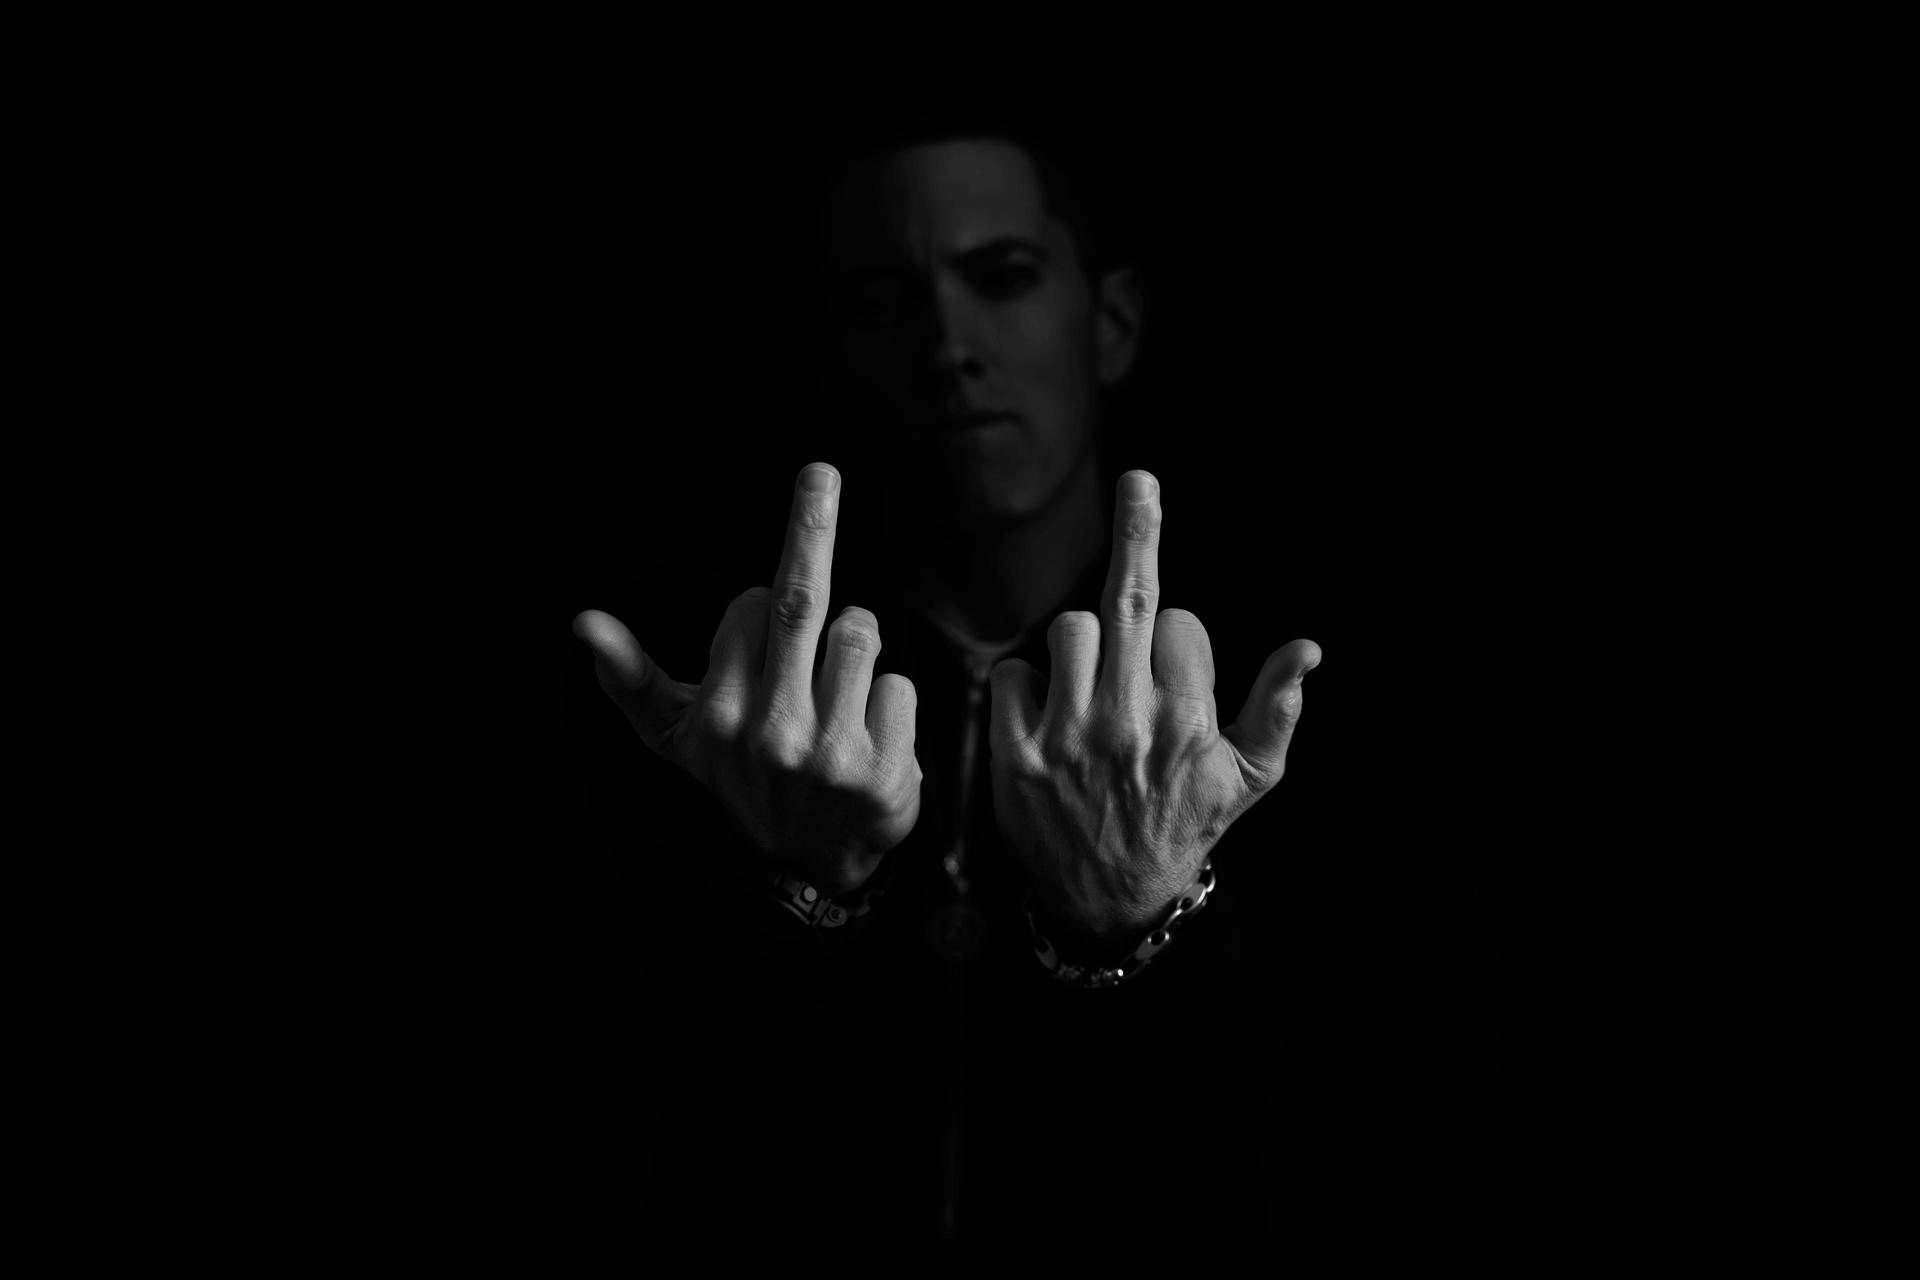 Eminem widescreen for desktop